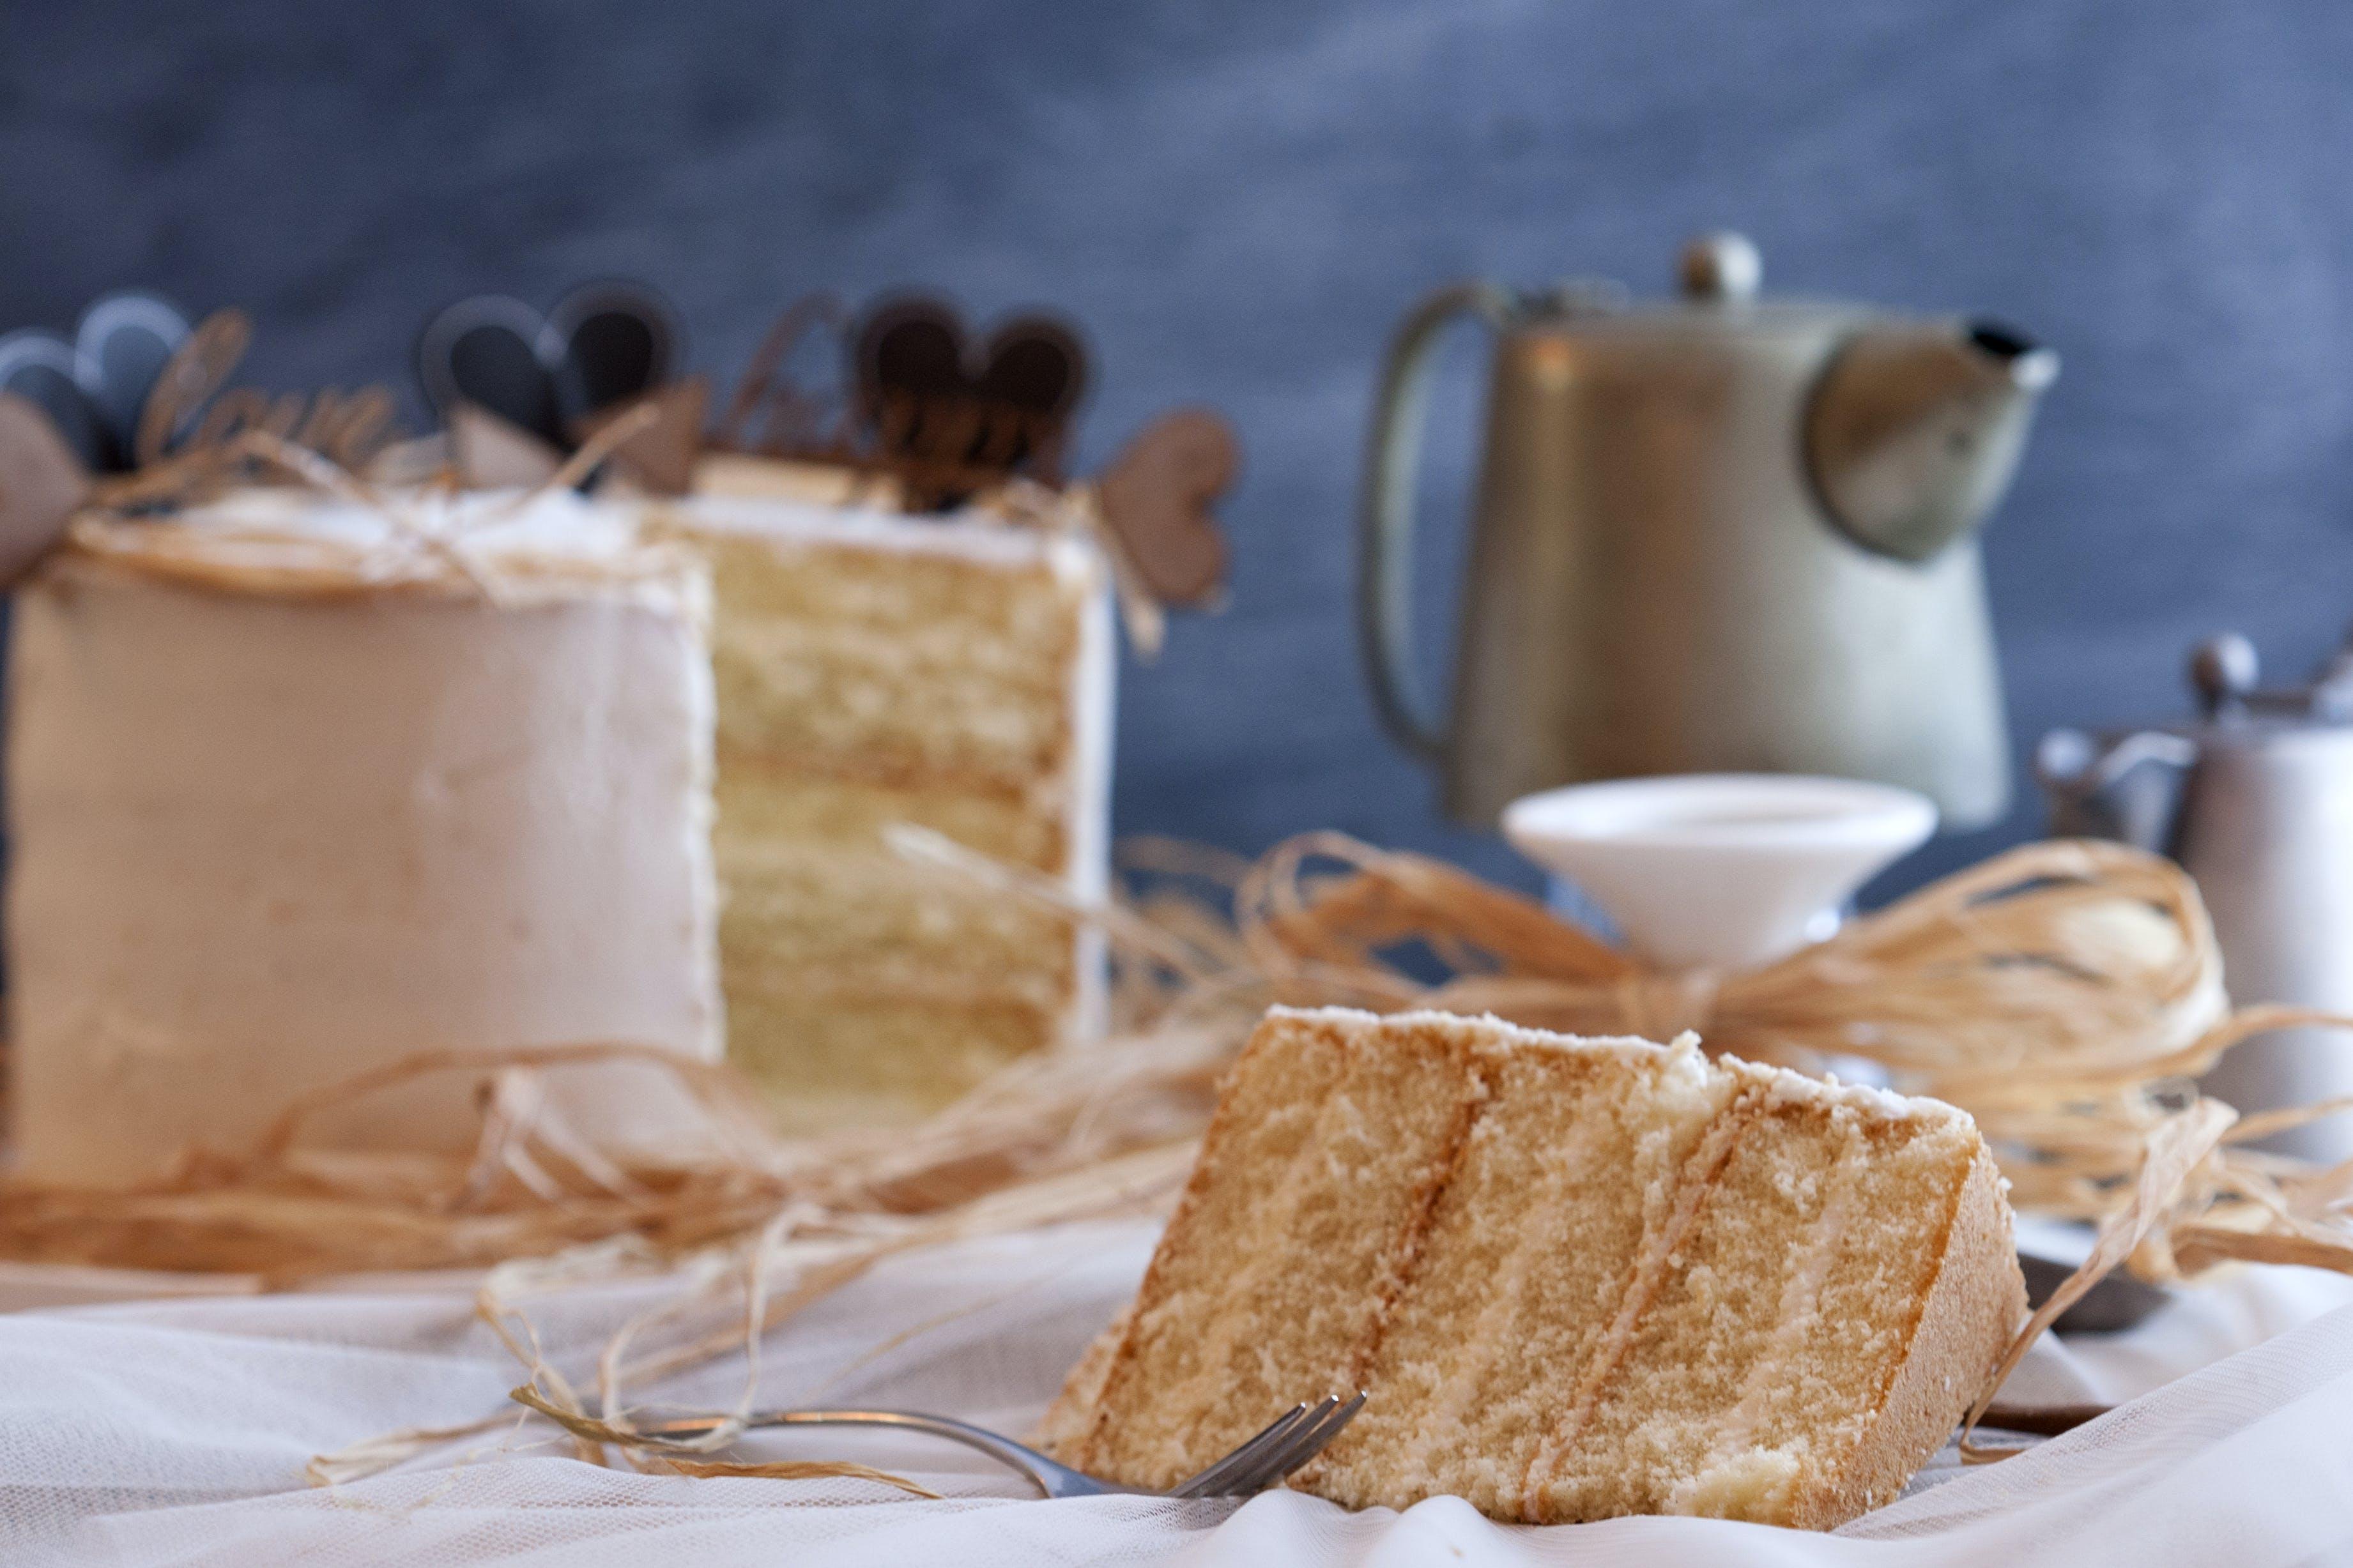 Free stock photo of bread, food, dessert, cake